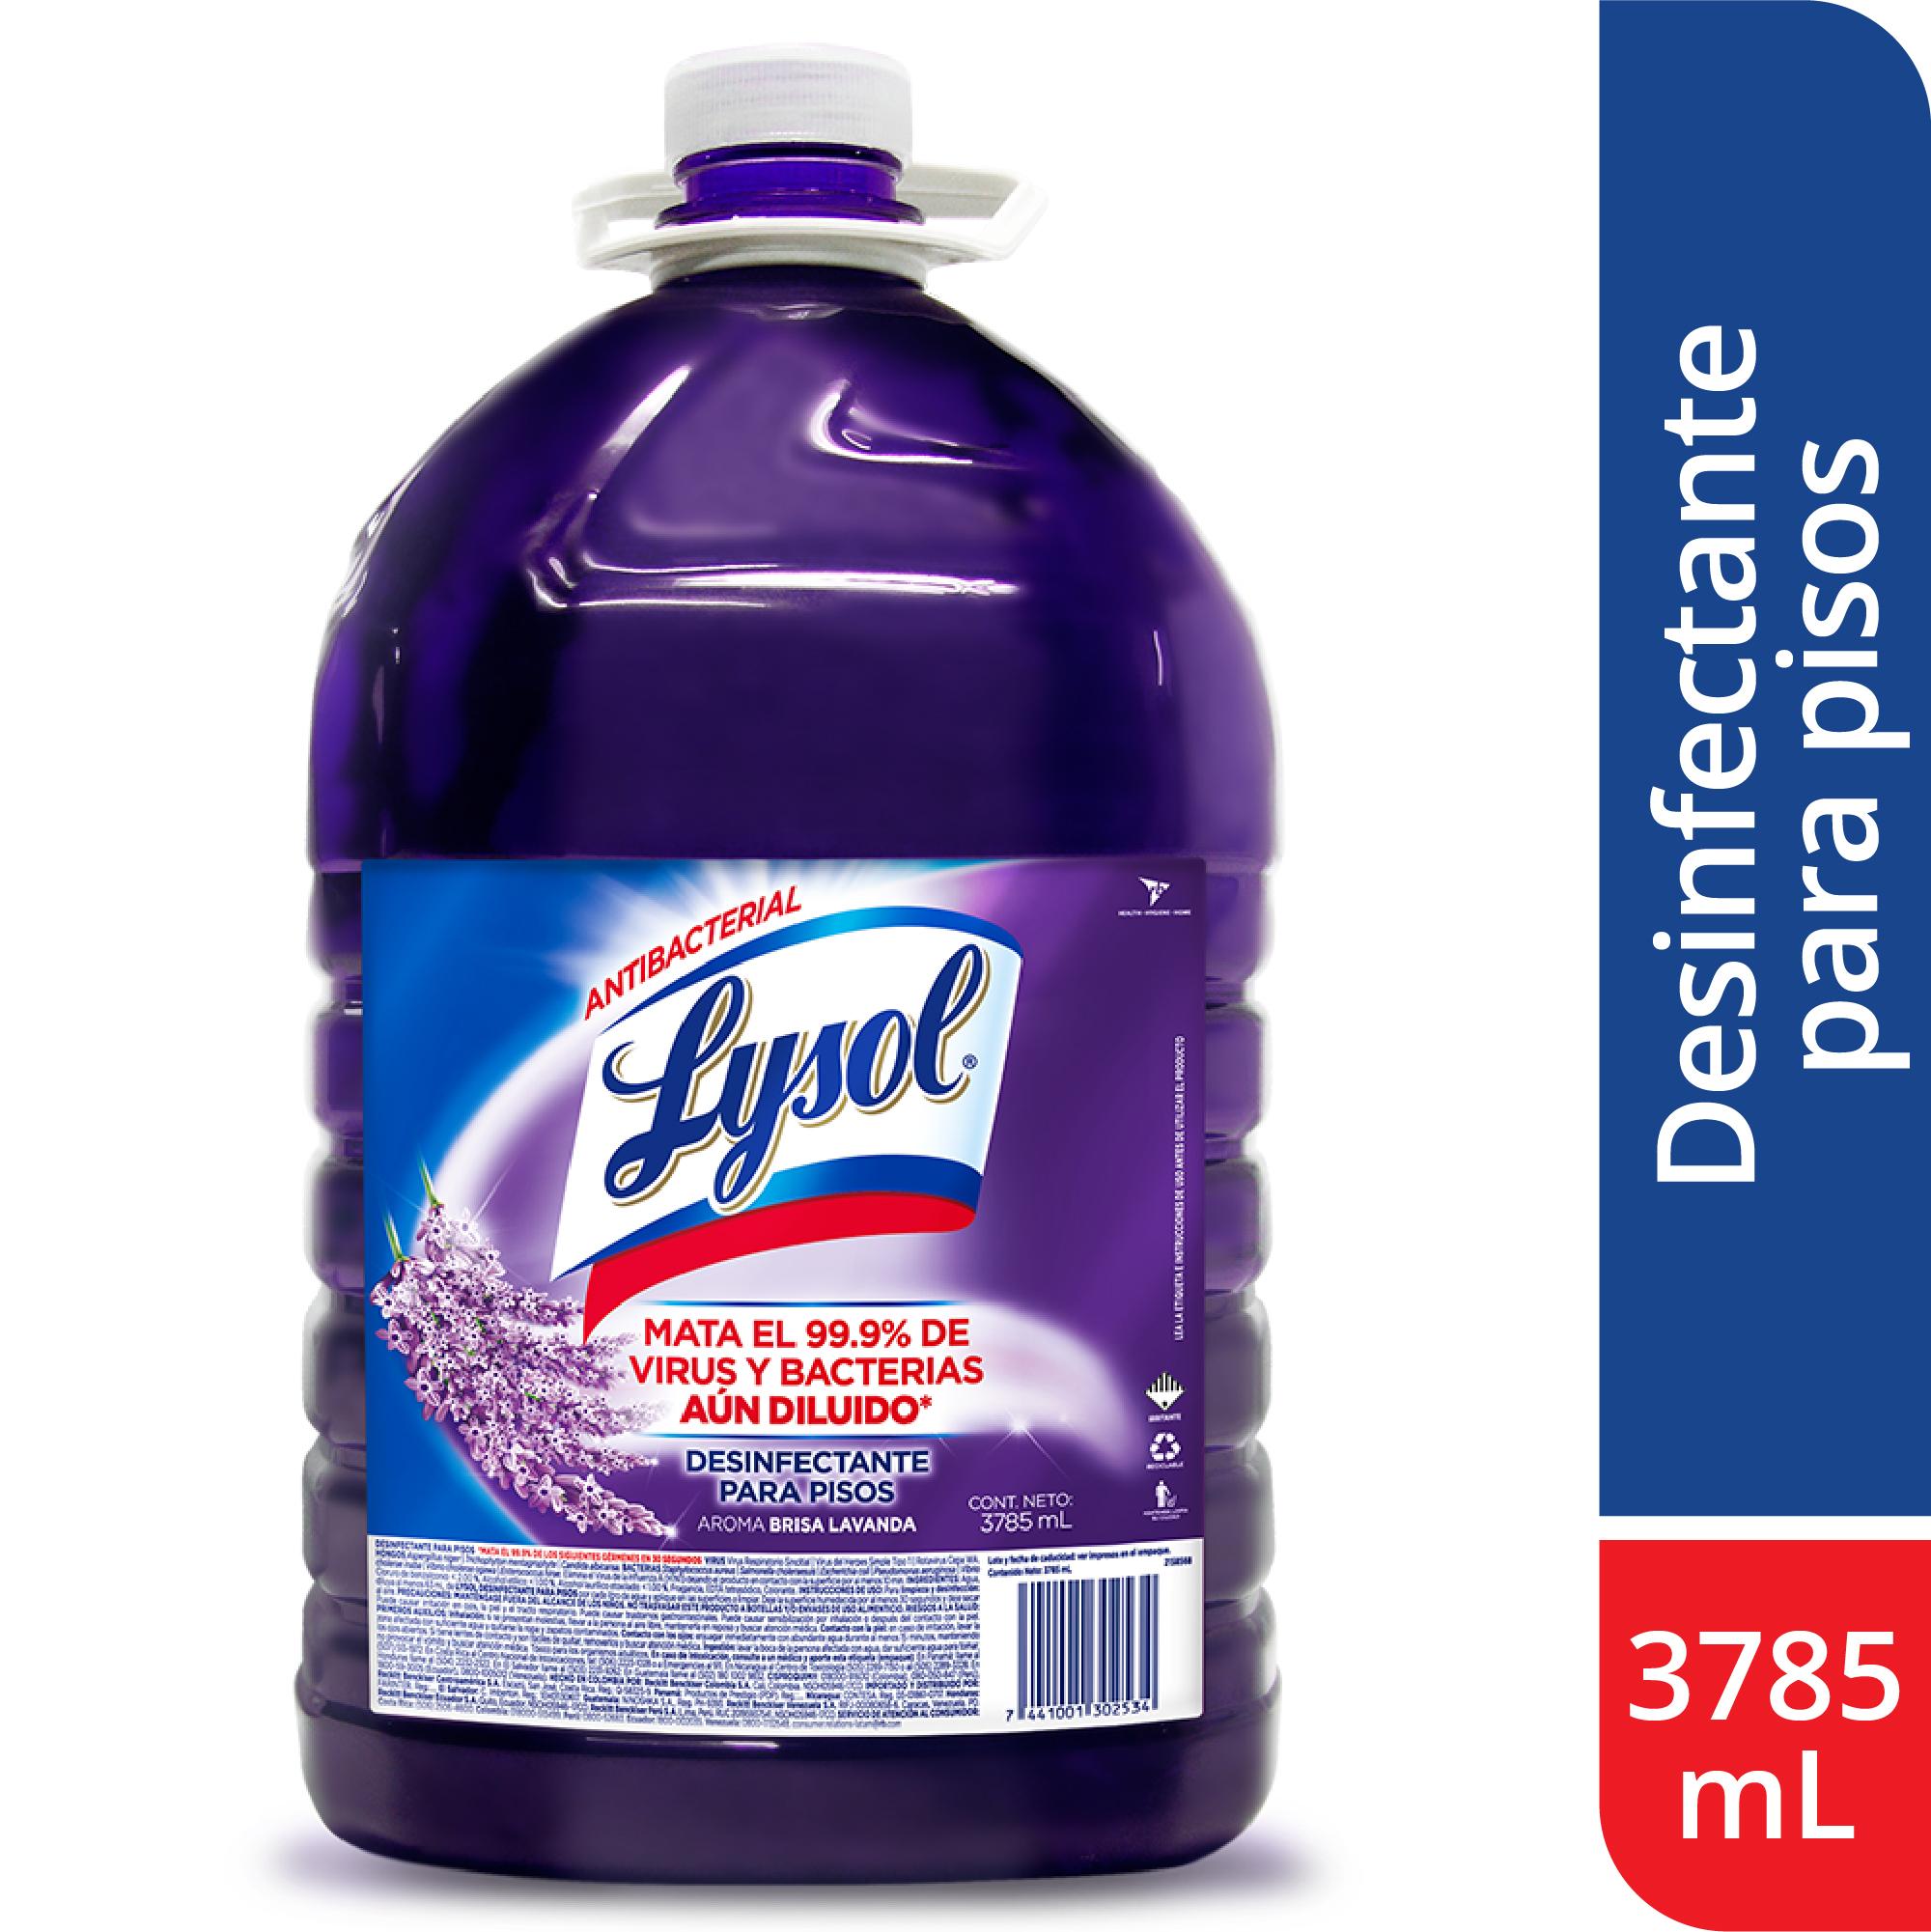 Desinfectante Para Pisos Lysol Lavanda 3785ml